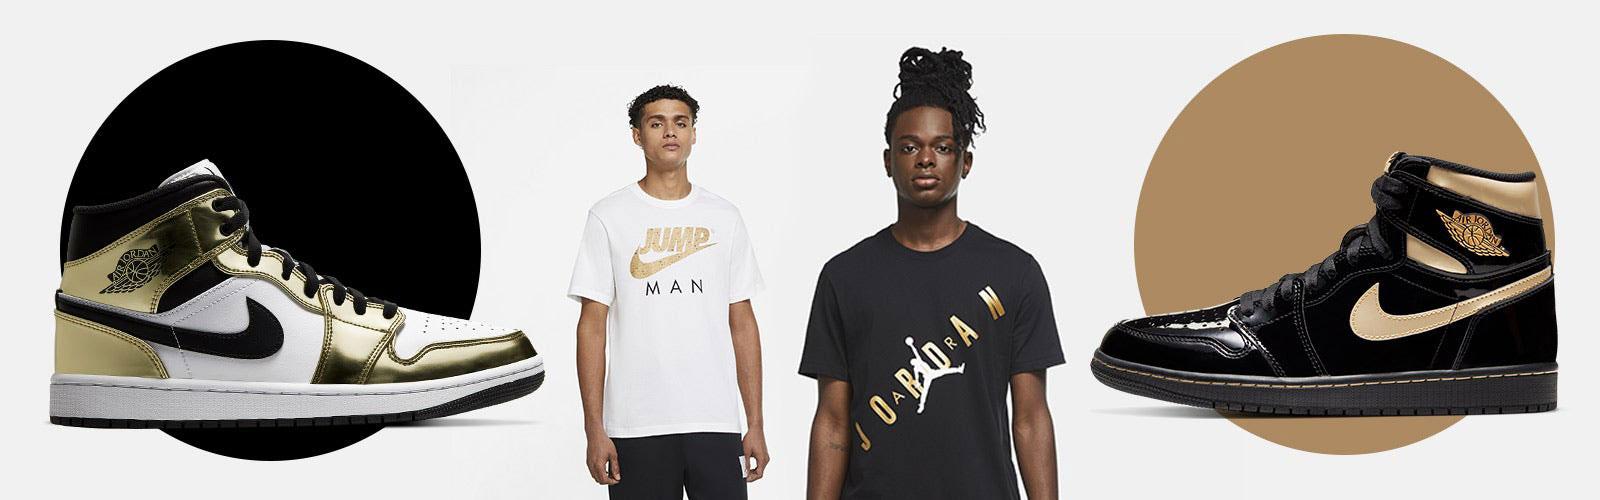 air-jordan-1-metallic-gold-sneaker-clothing-outfits